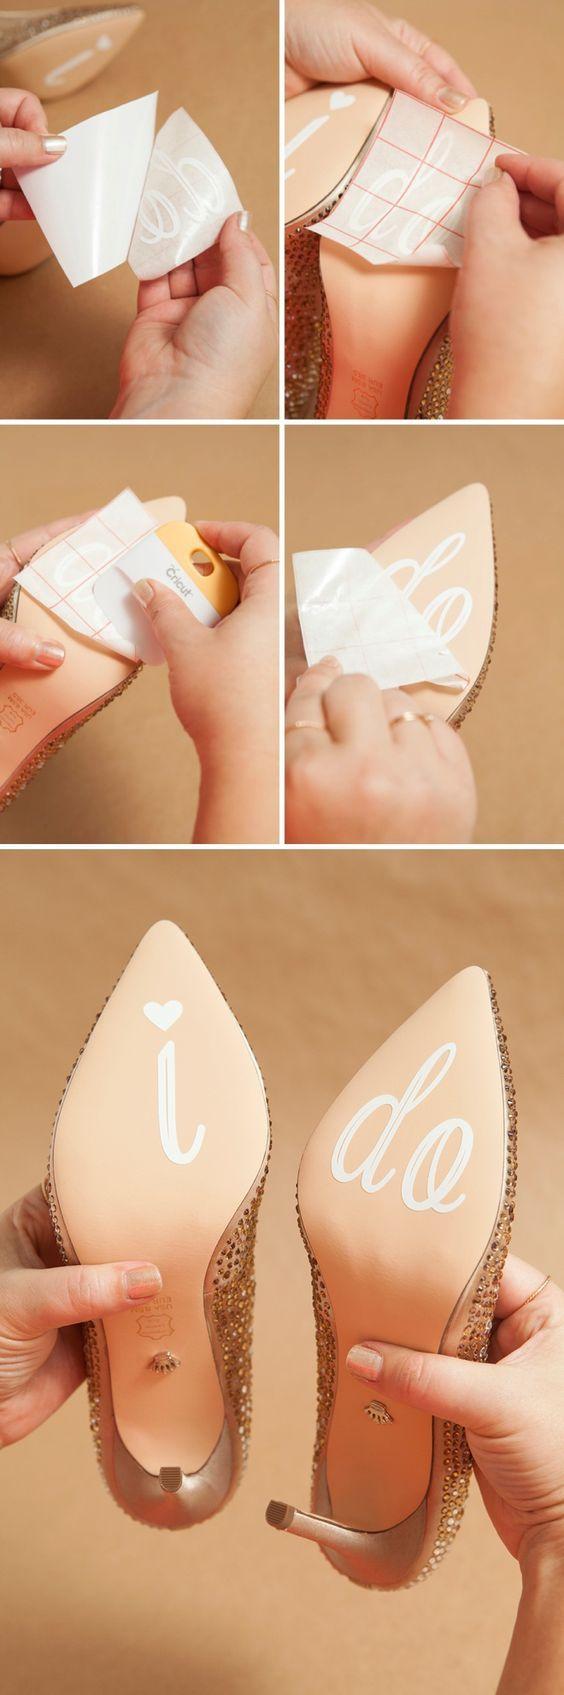 Learn how to make custom wedding shoe stickers!: